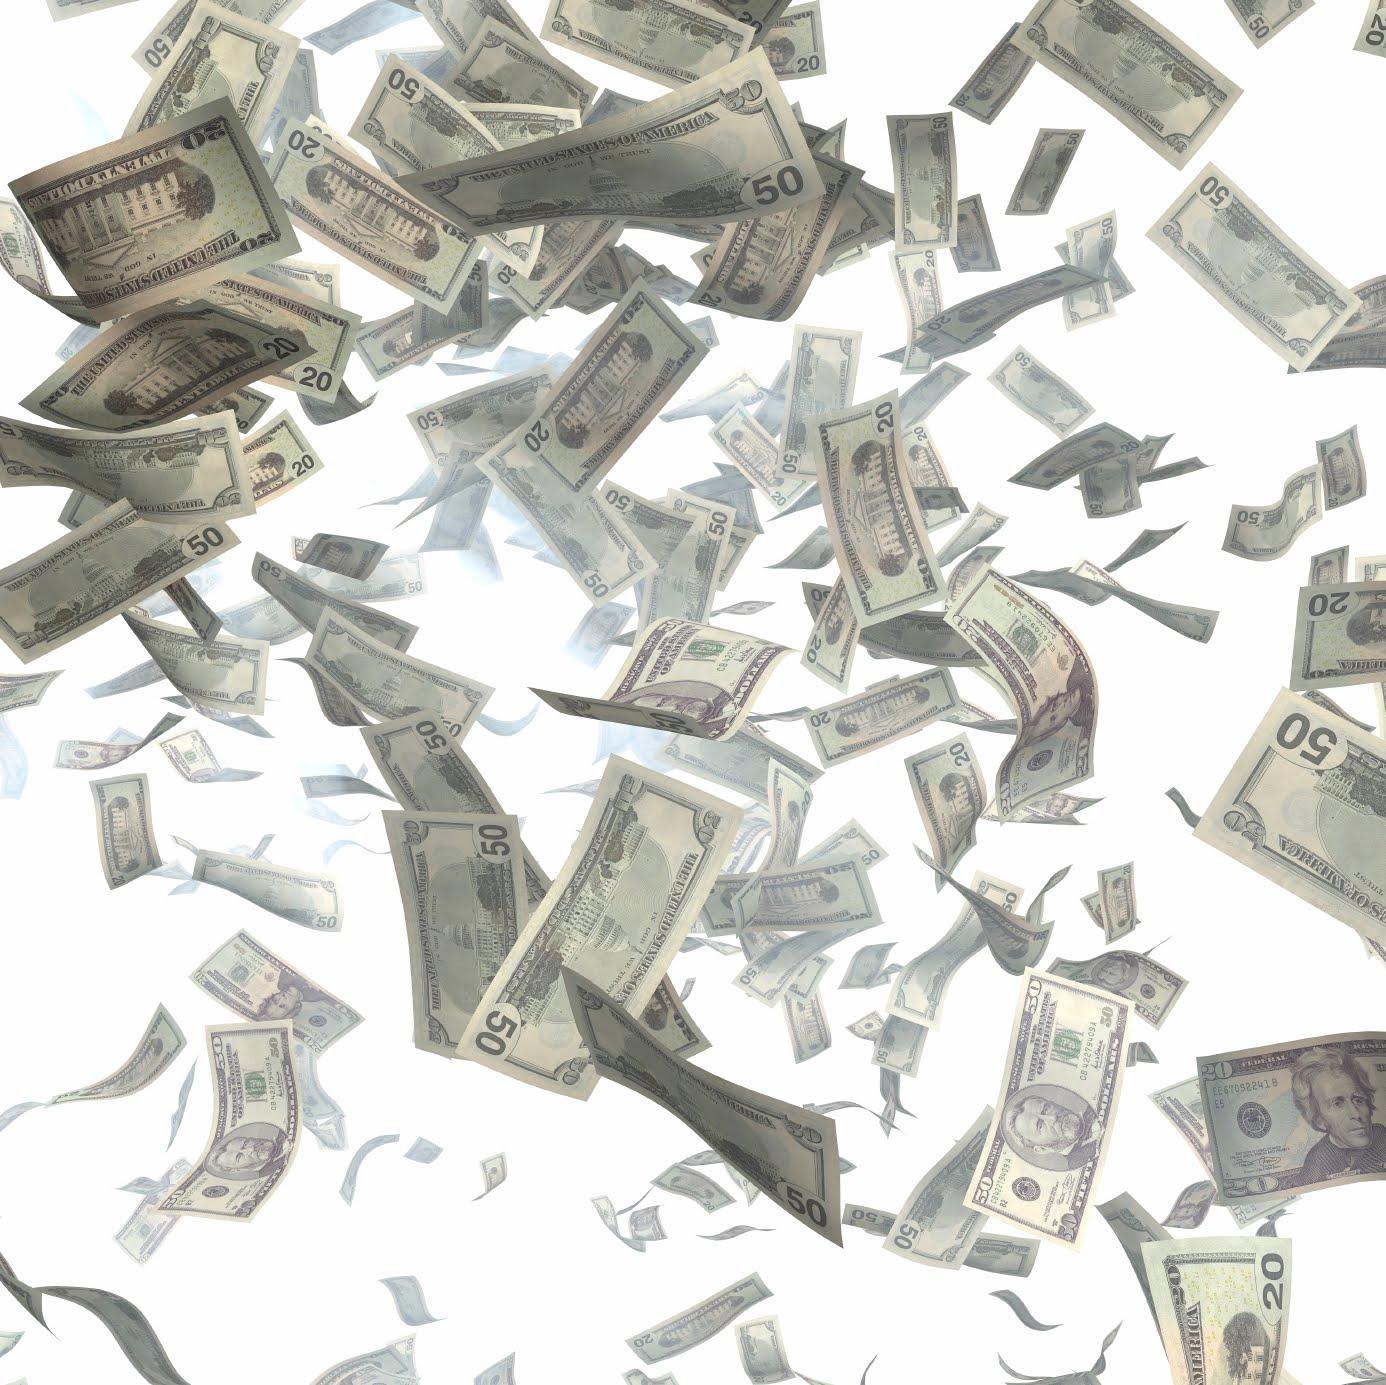 Falling Money Wallpaper HD wallpaper background 1386x1385